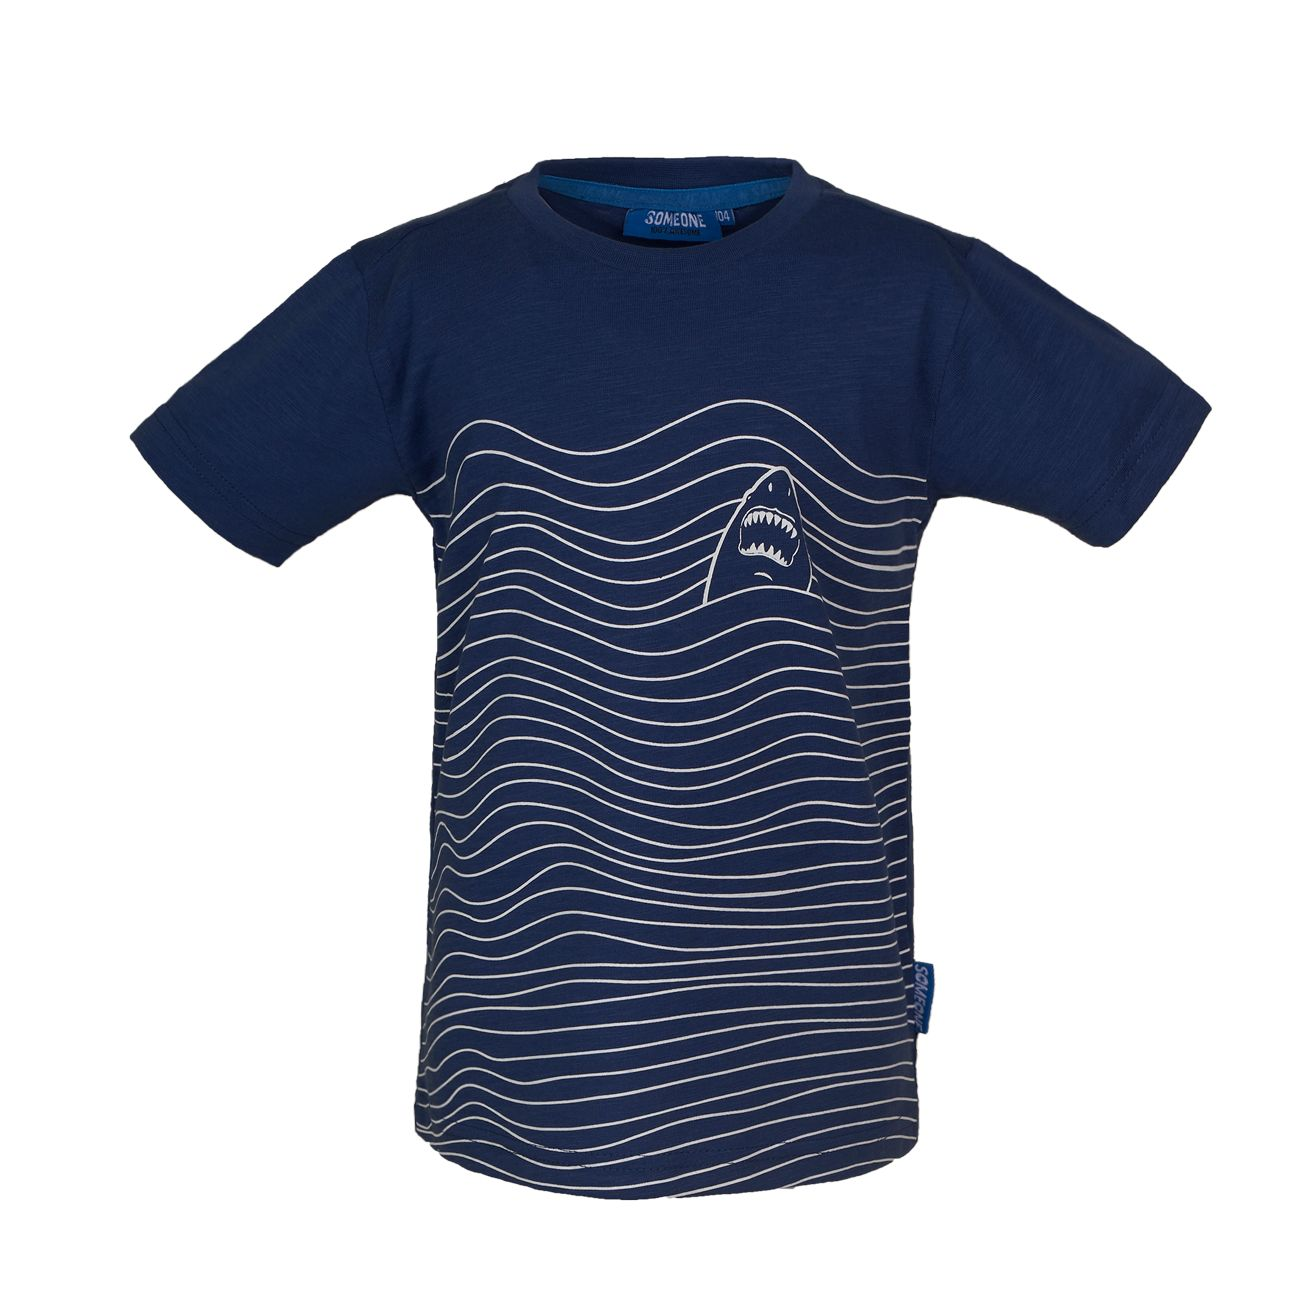 T-Shirt Hai 098 Blue SOMEONE 100% Awesome